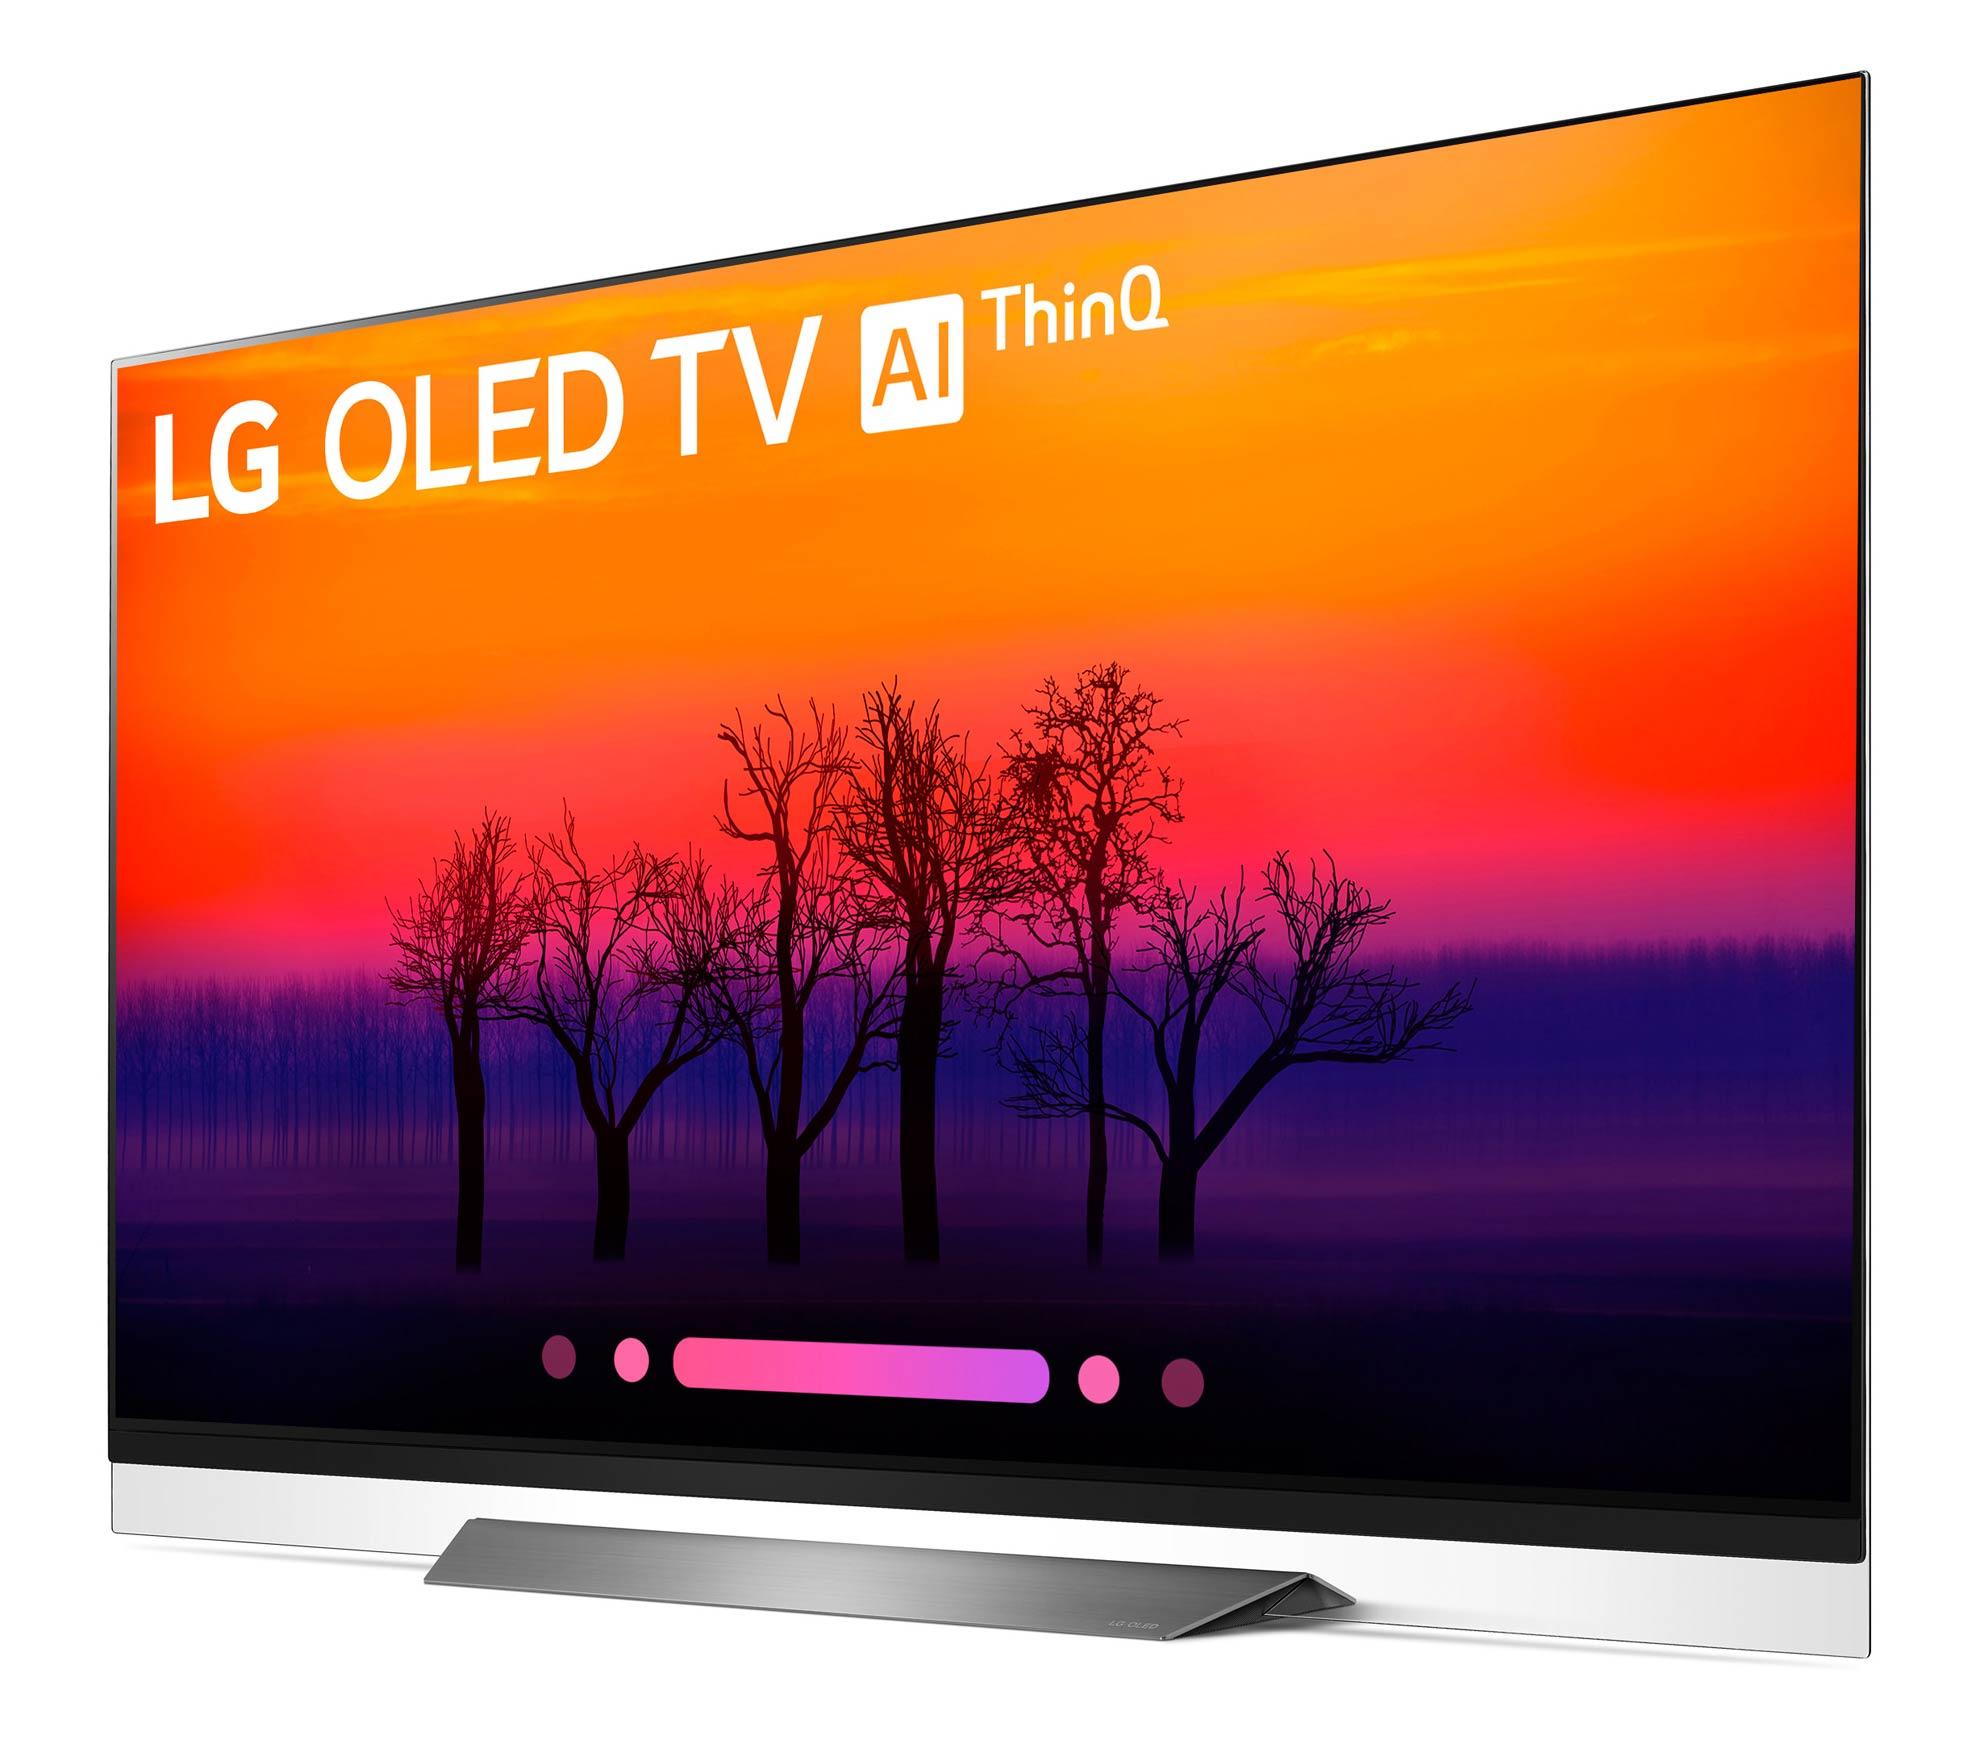 LG OLED65E8 - 2018er Modell mit 60W Soundbar [Amazon Prime]